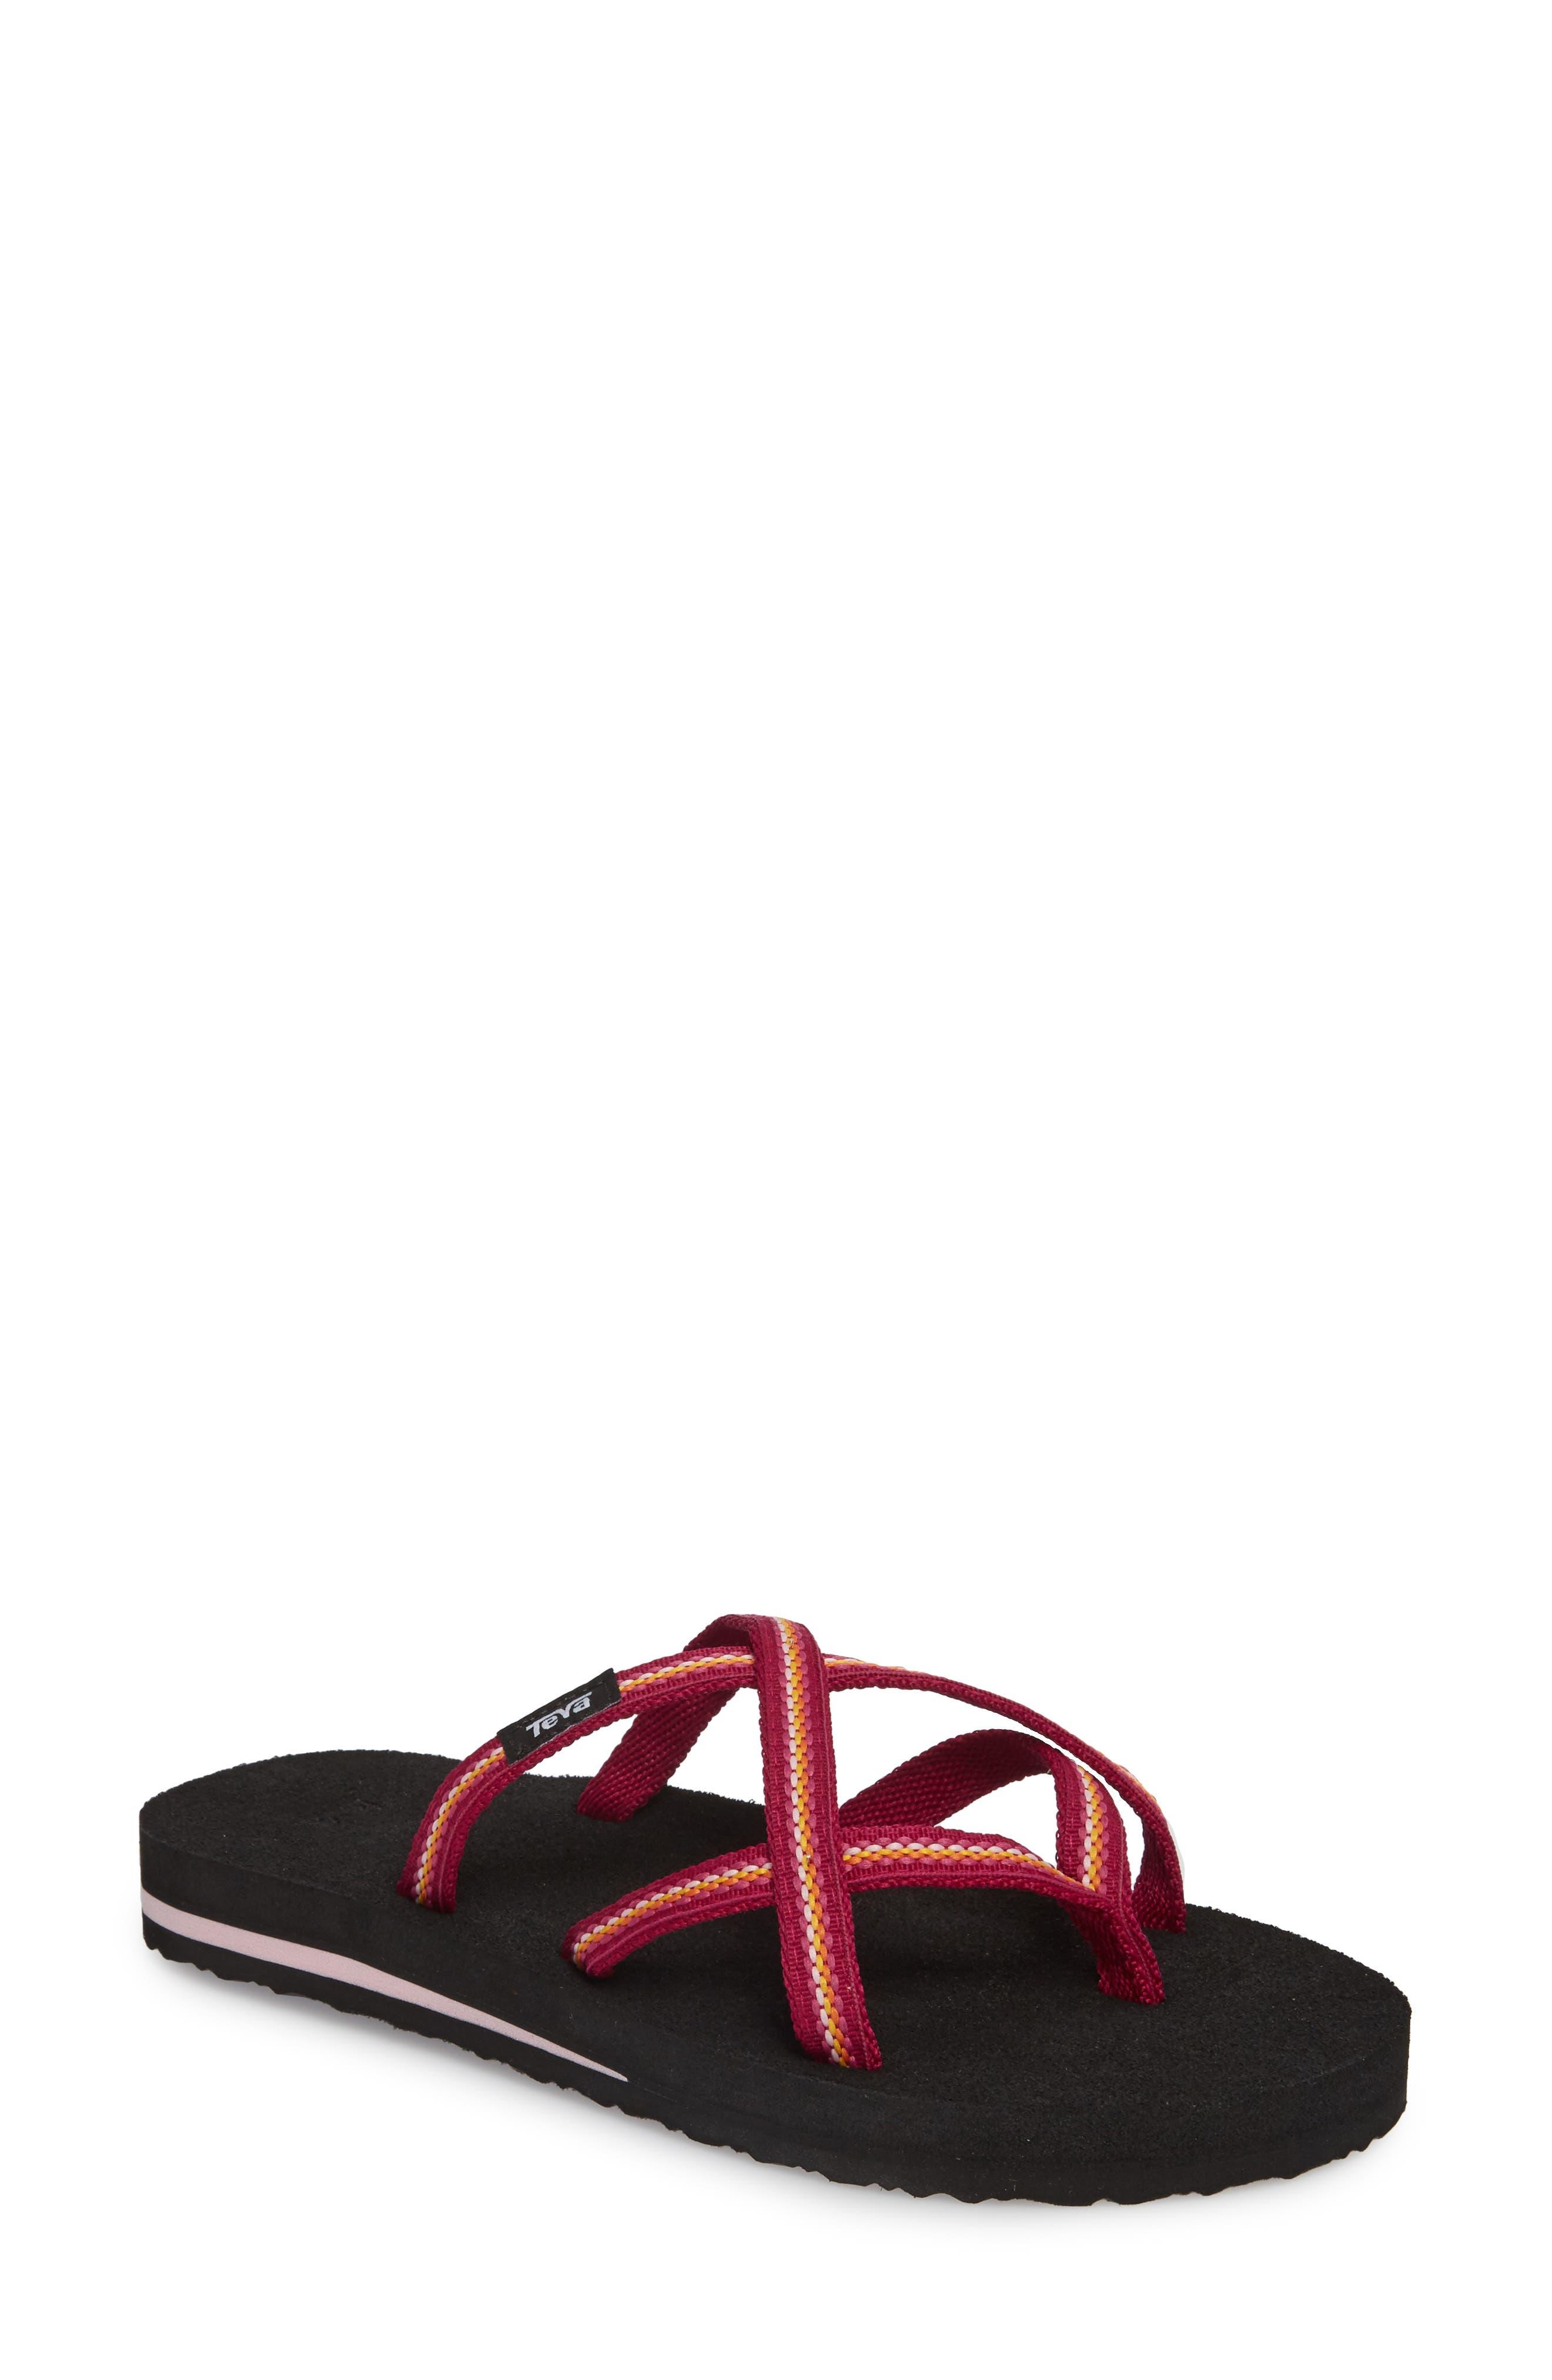 TEVA 'Olowahu' Sandal, Main, color, BOYSENBERRY FABRIC